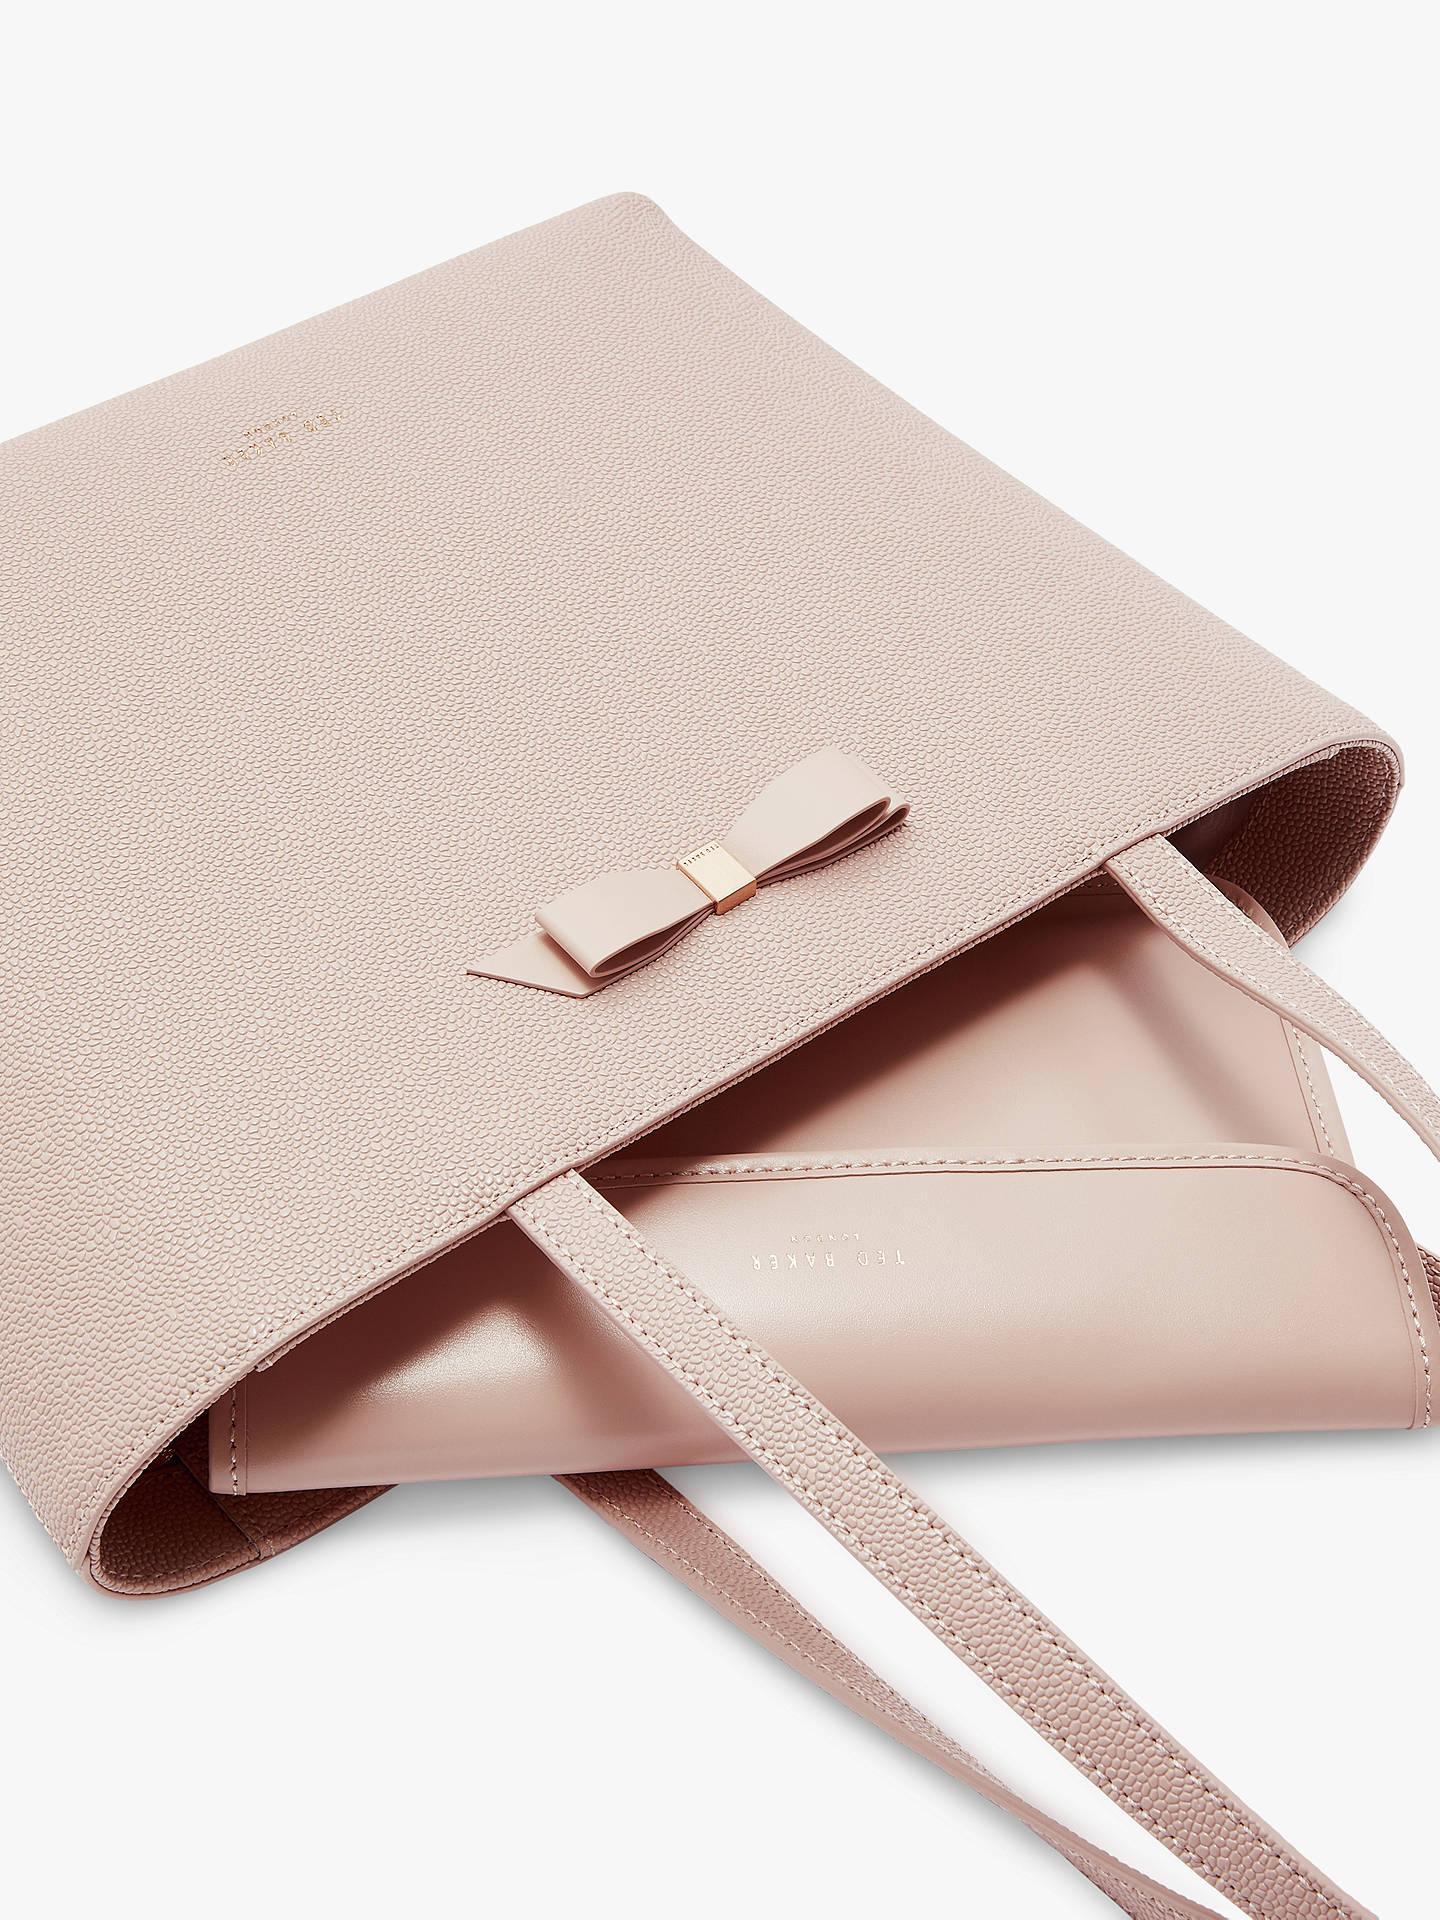 ebf48f55b5 ... Buy Ted Baker Jessica Bow Leather Shopper Bag, Light Pink Online at  johnlewis.com ...